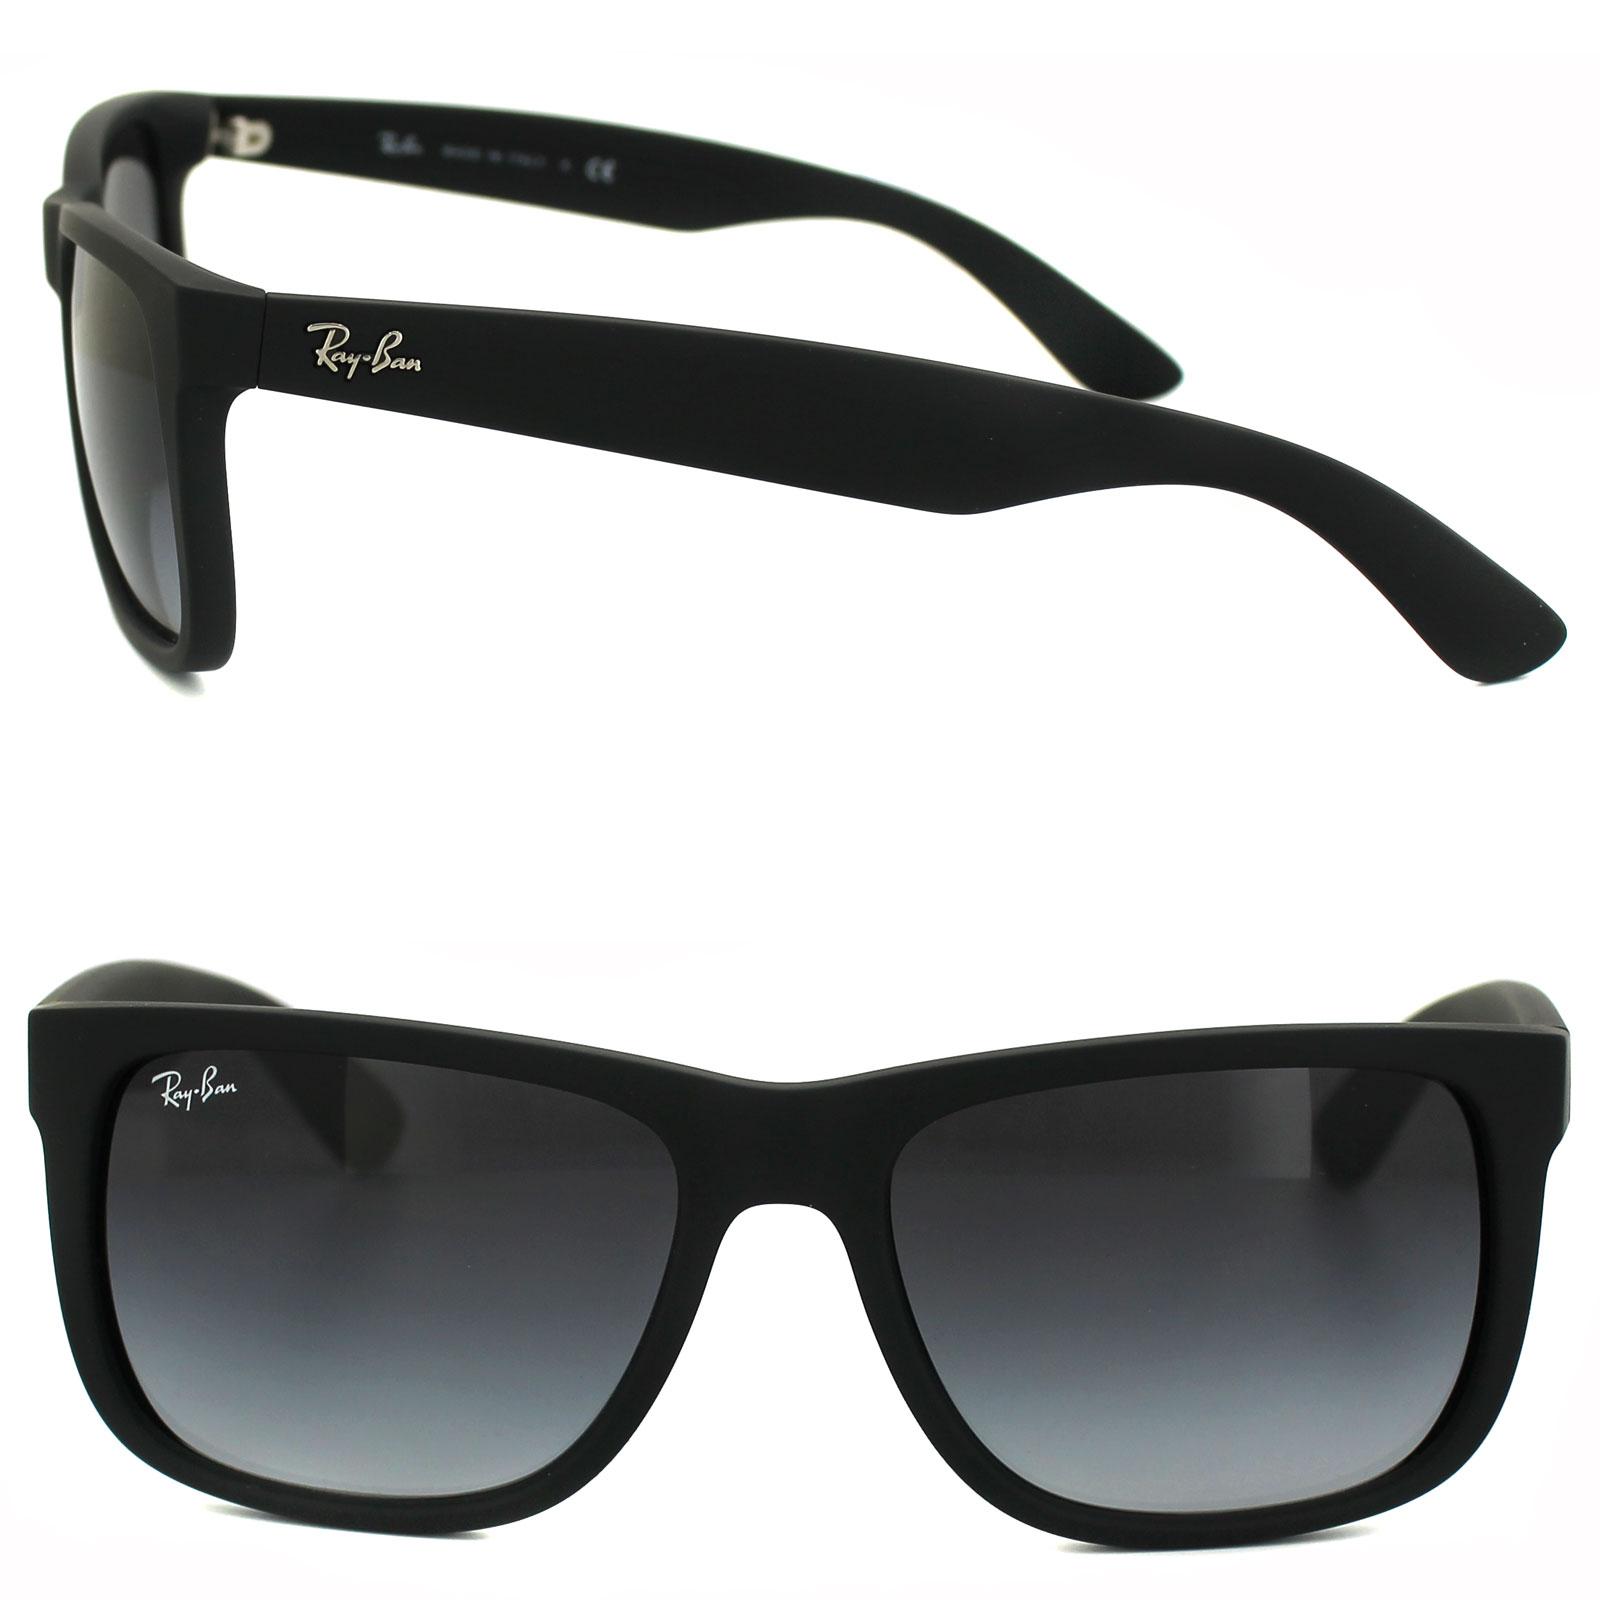 1d7b891f946 Sentinel Ray-Ban Sunglasses Justin 4165 Rubber Black Grey Gradient 601 8G  Large 55mm. Sentinel Thumbnail 3